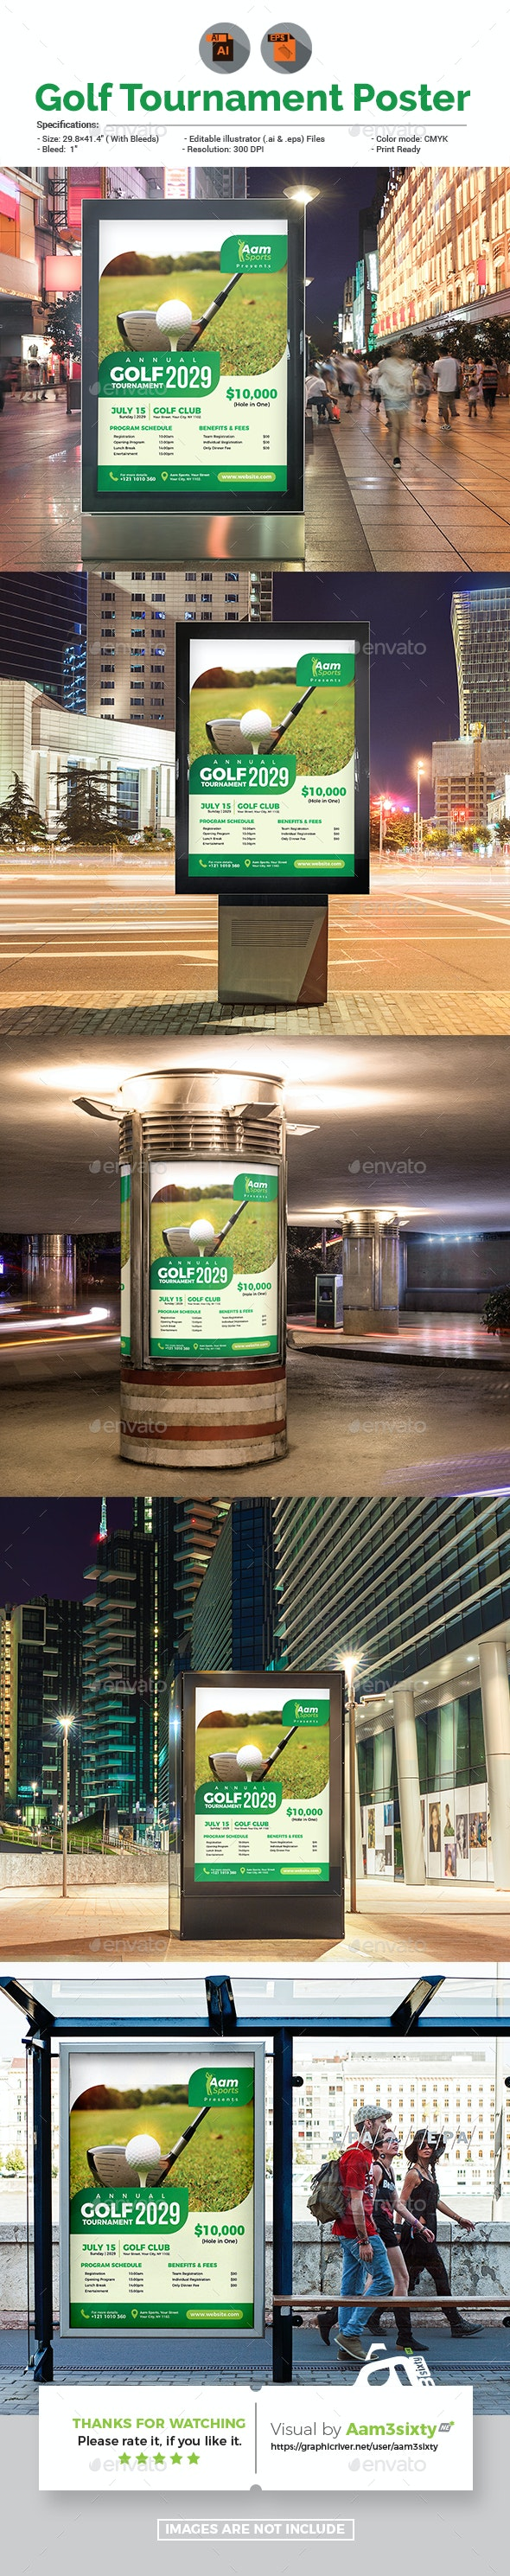 Golf Tournament Poster Template - Signage Print Templates